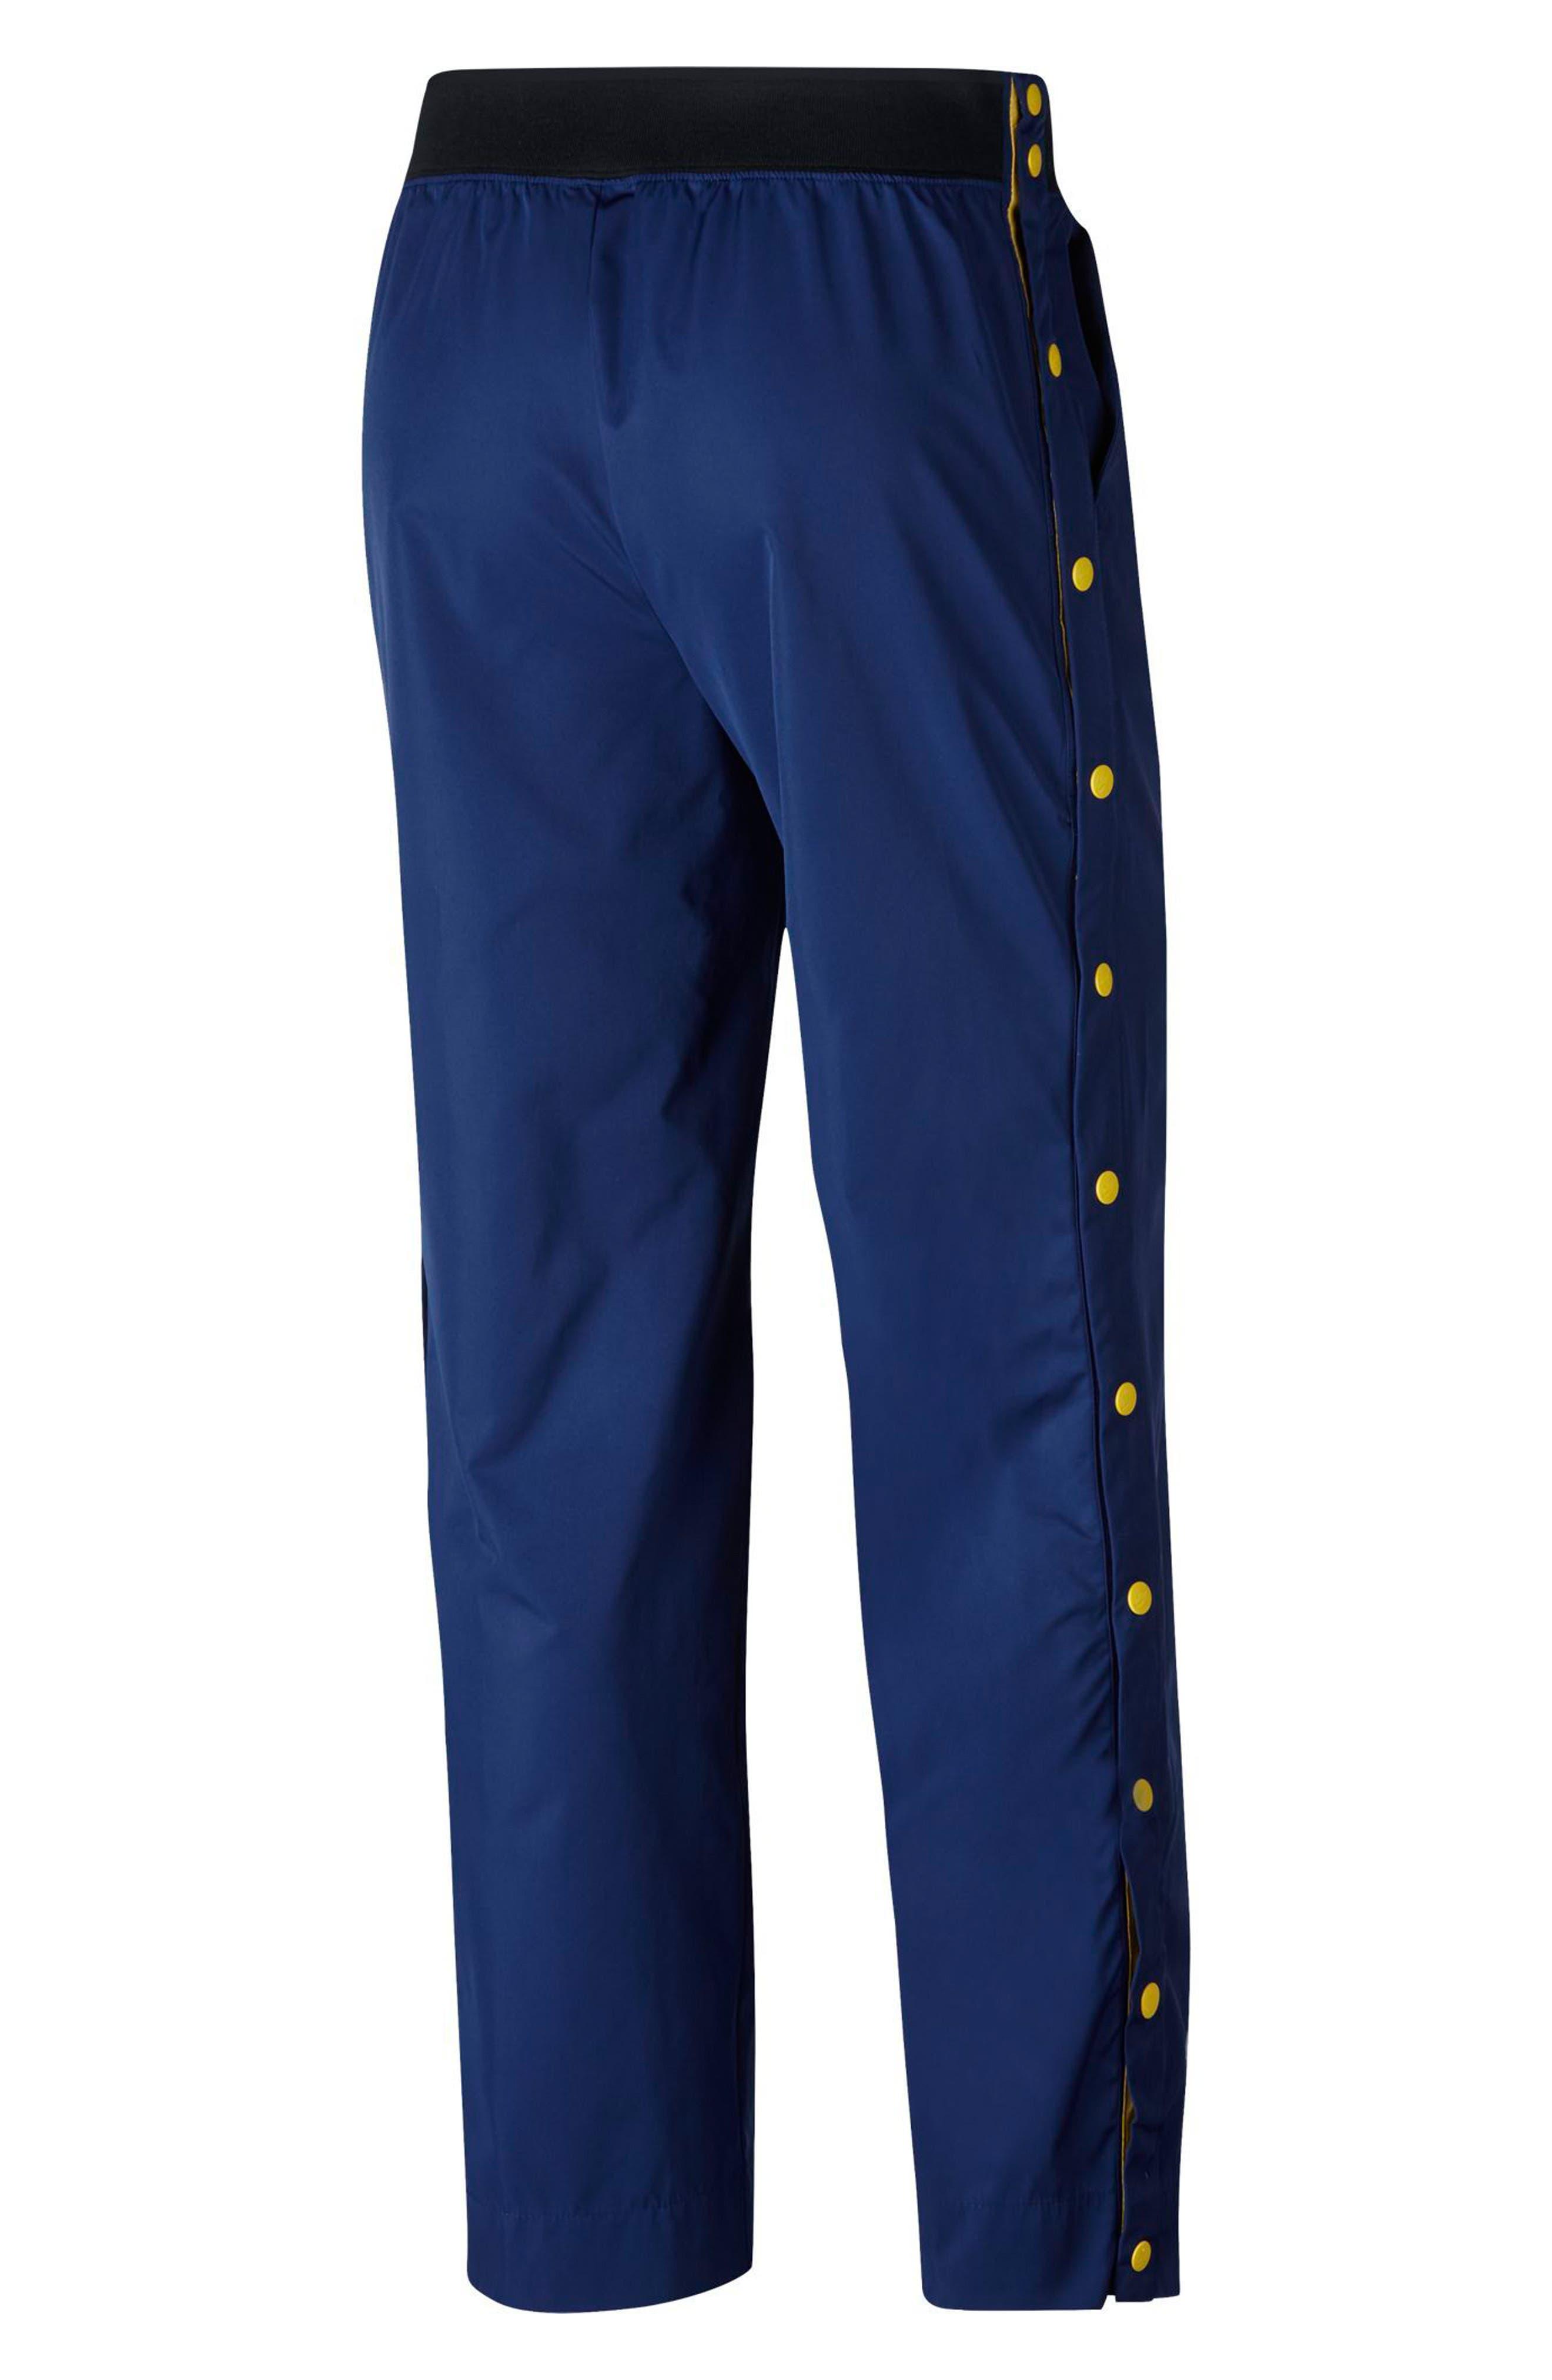 Sportswear Women's Side Snap Pants,                             Alternate thumbnail 2, color,                             455